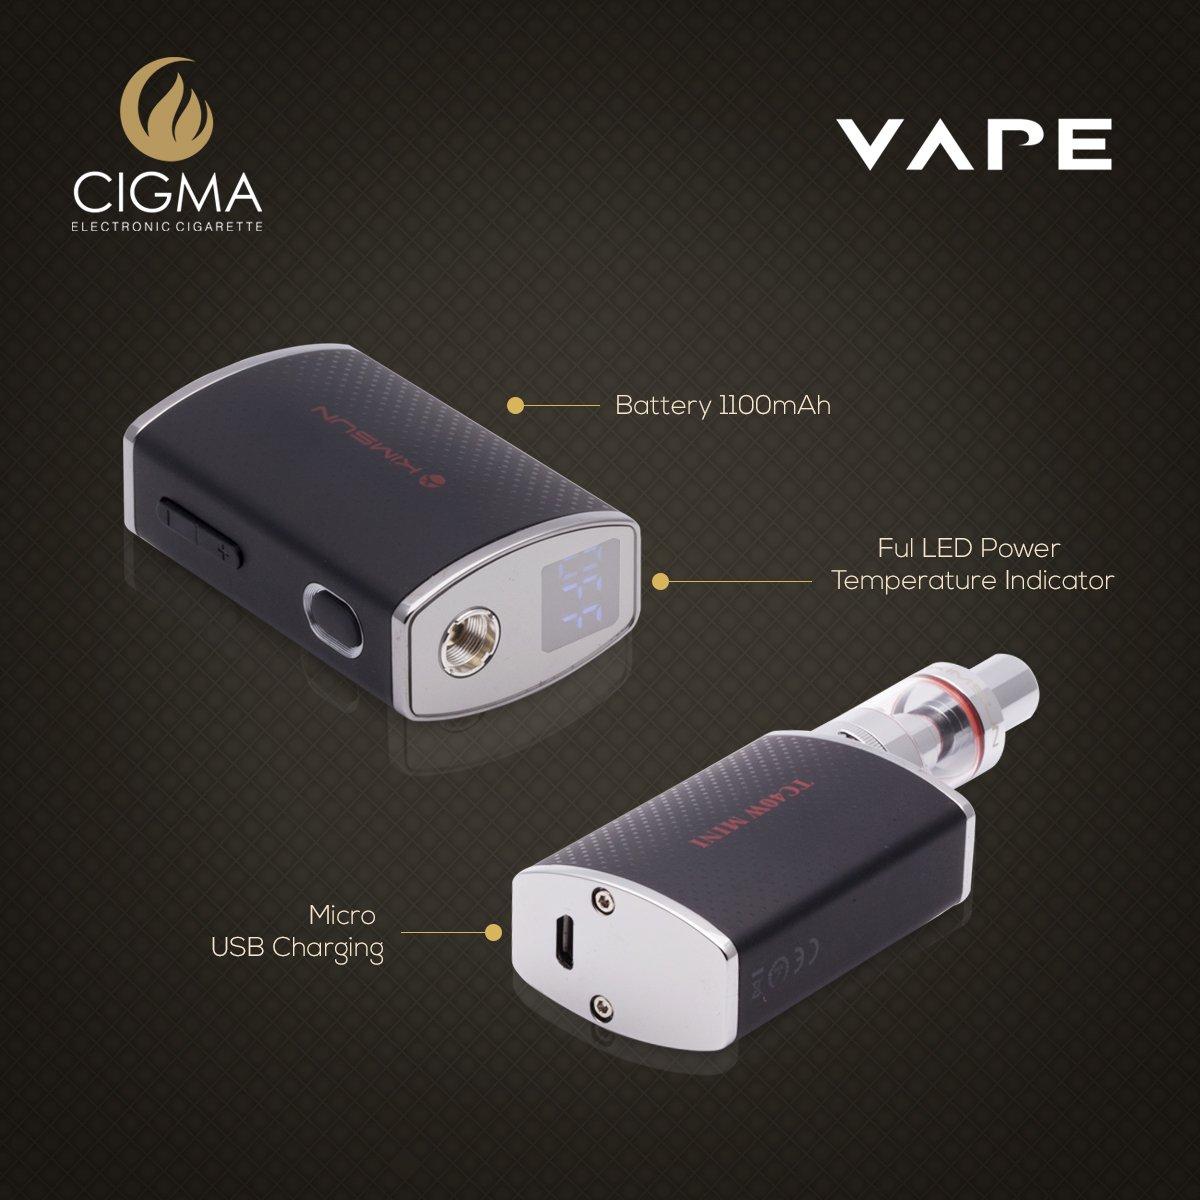 CIGMA El Box Mod | Kit de cigarrillos electrónico | 40W 0.6 Ohm Sub ohm Kit de vapeo con indicador LED de temperatura | FLUJO DE AIRE | Micro USB ...